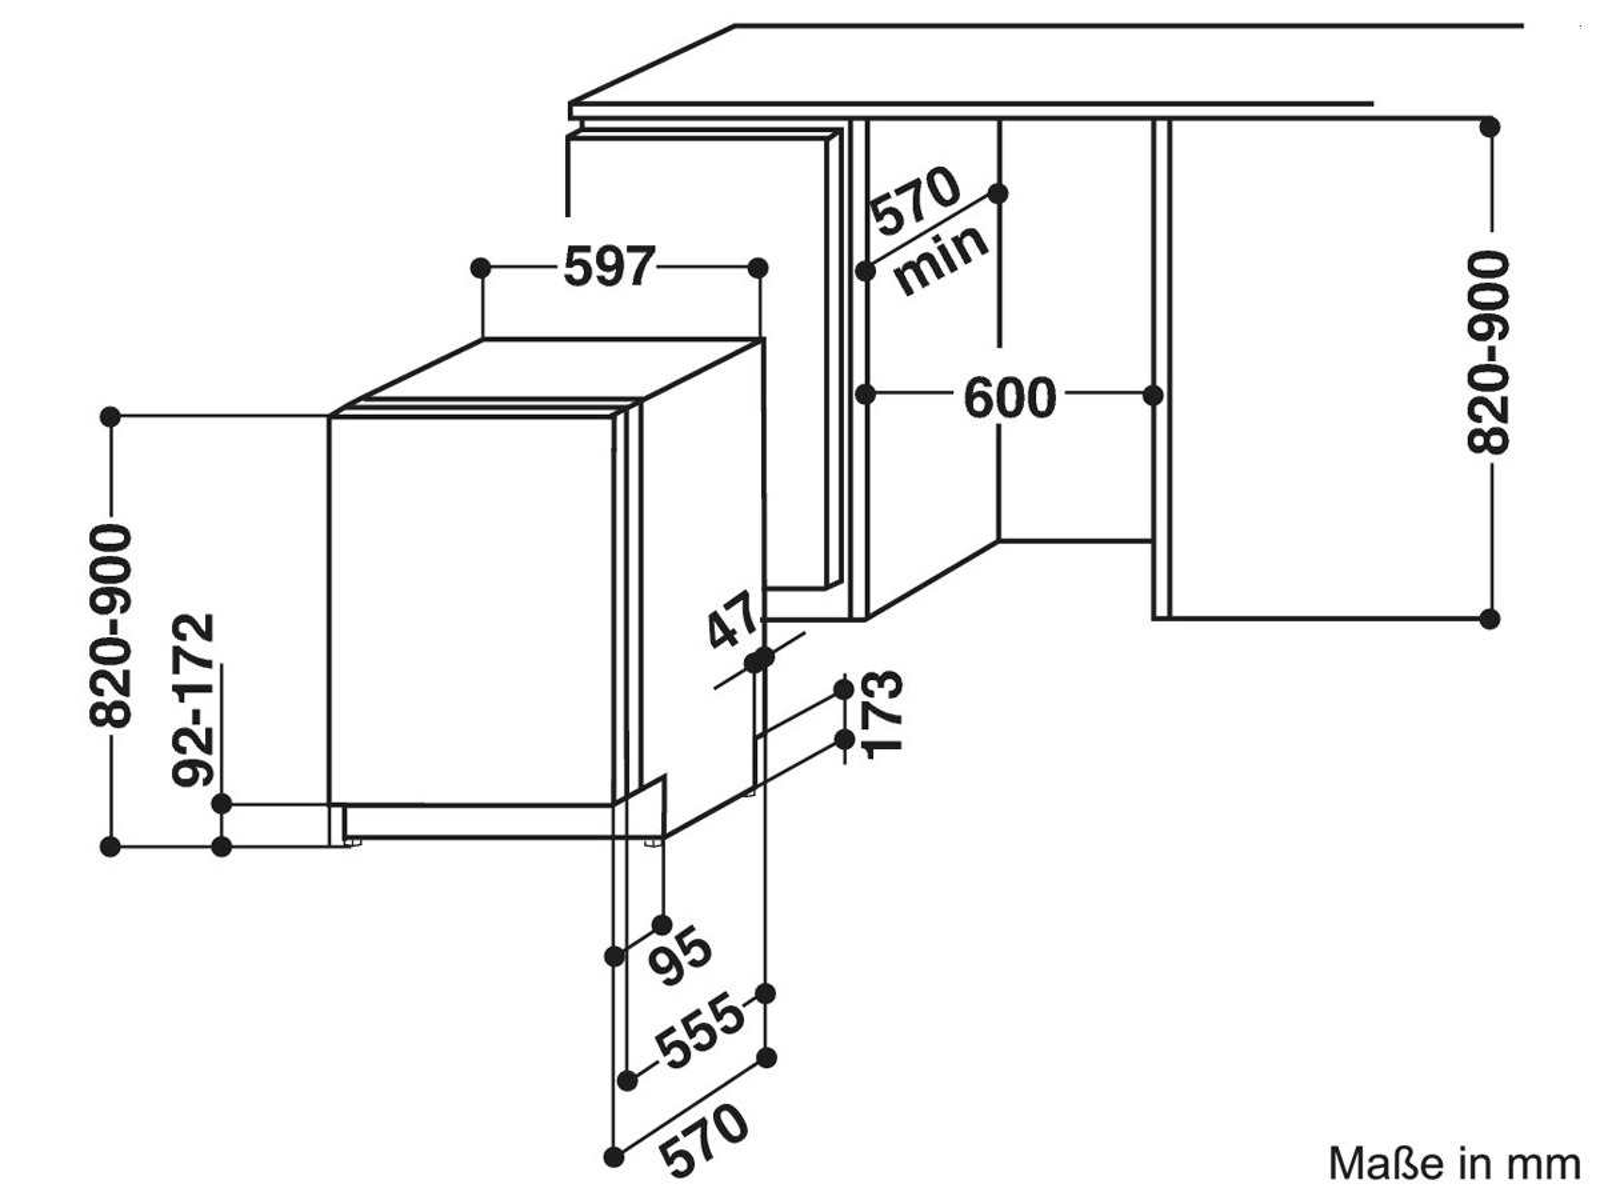 bauknecht gsx 158112 a vollintegrierbarer einbau geschirrsp ler sp lmaschine ebay. Black Bedroom Furniture Sets. Home Design Ideas